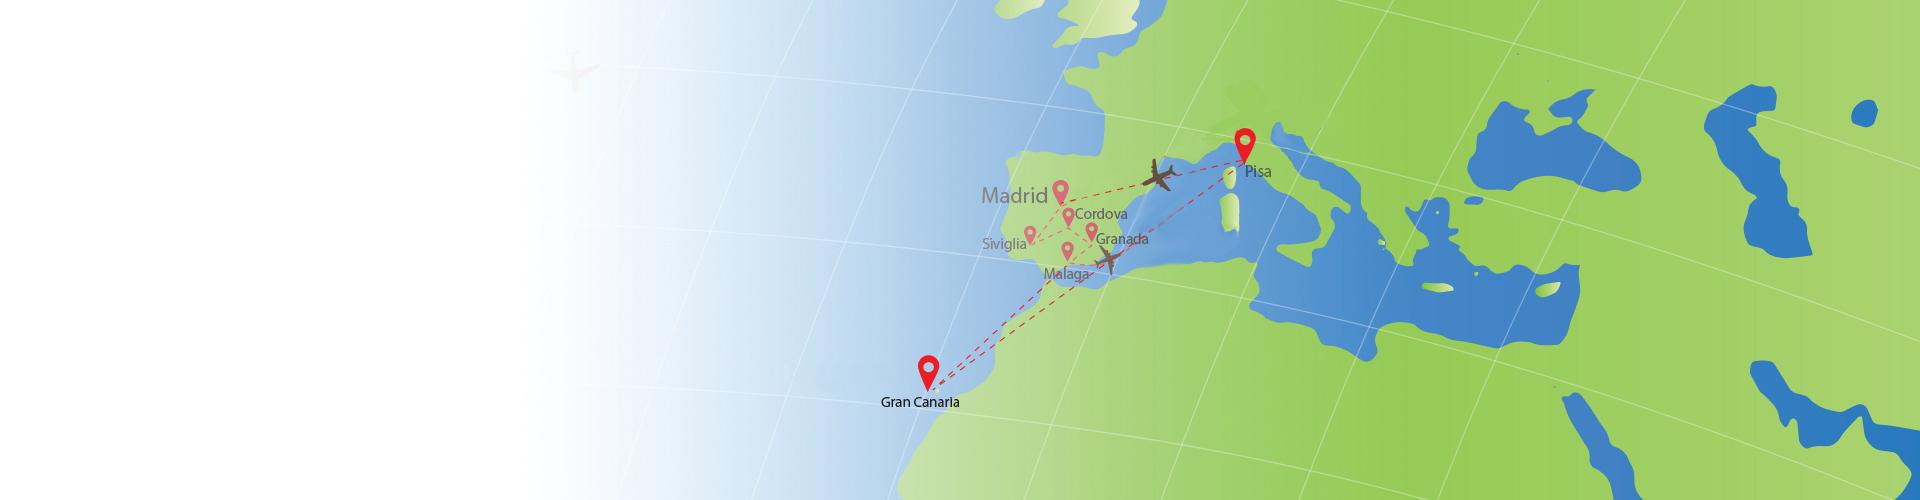 Spagna E Canarie Cartina.Pagine Sposi